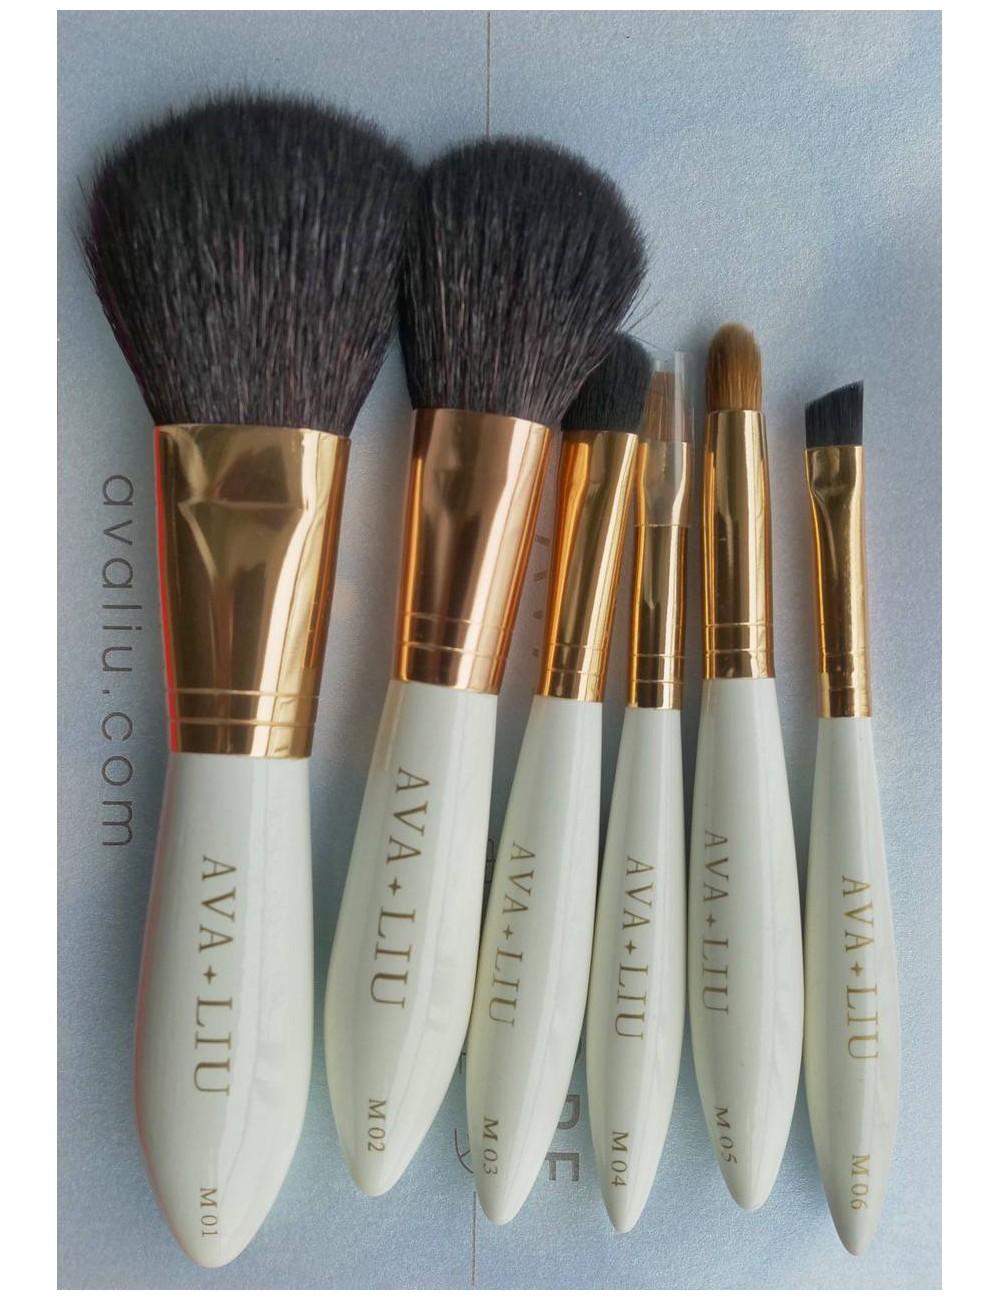 AVA.LIU Mini Brush Limited Set